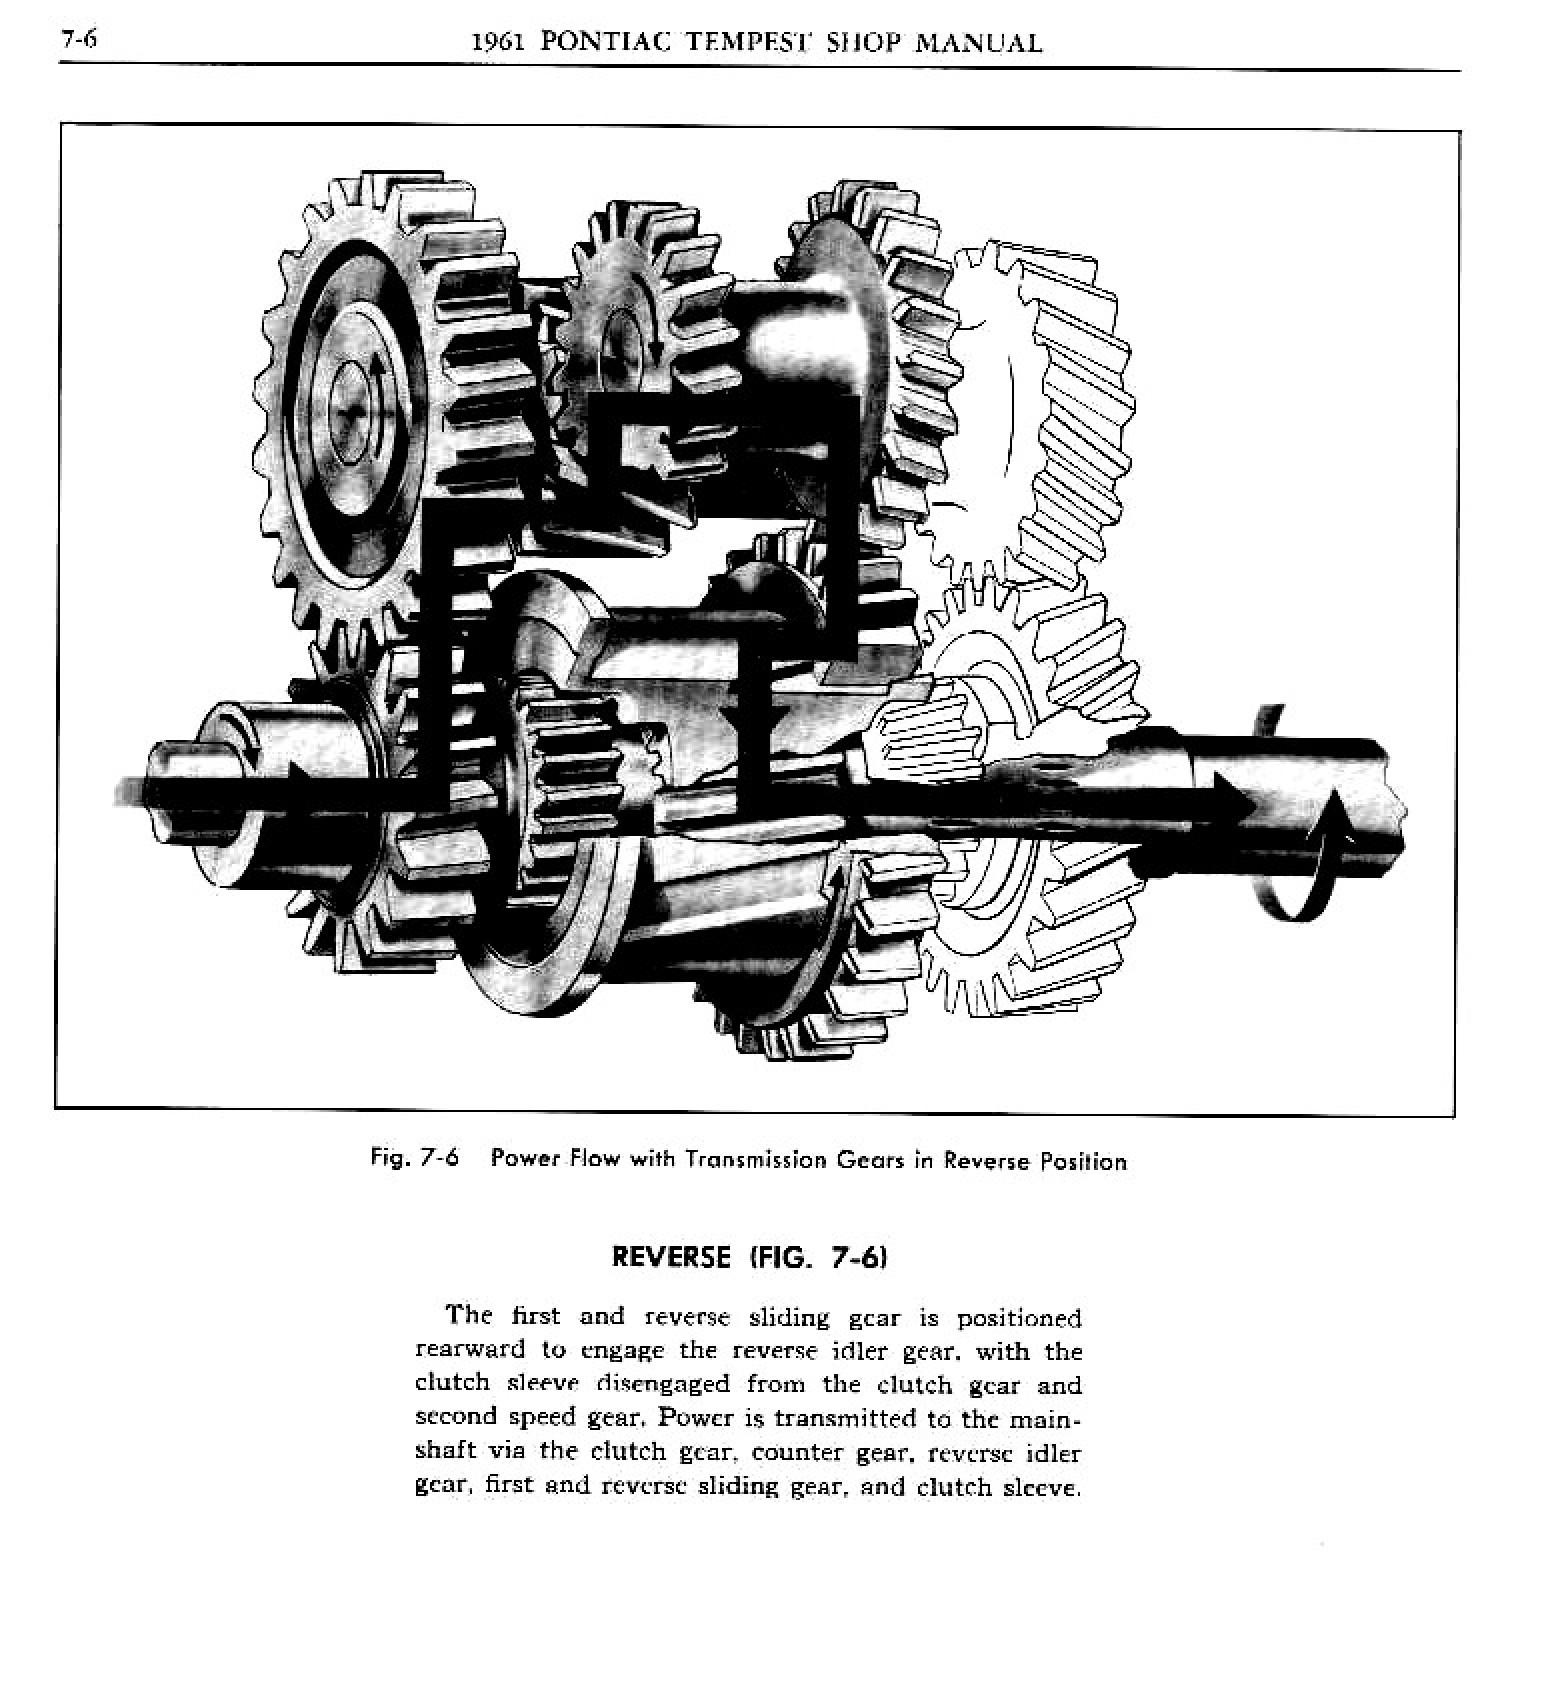 1961 Pontiac Tempest Shop Manual- Synchro-Mesh